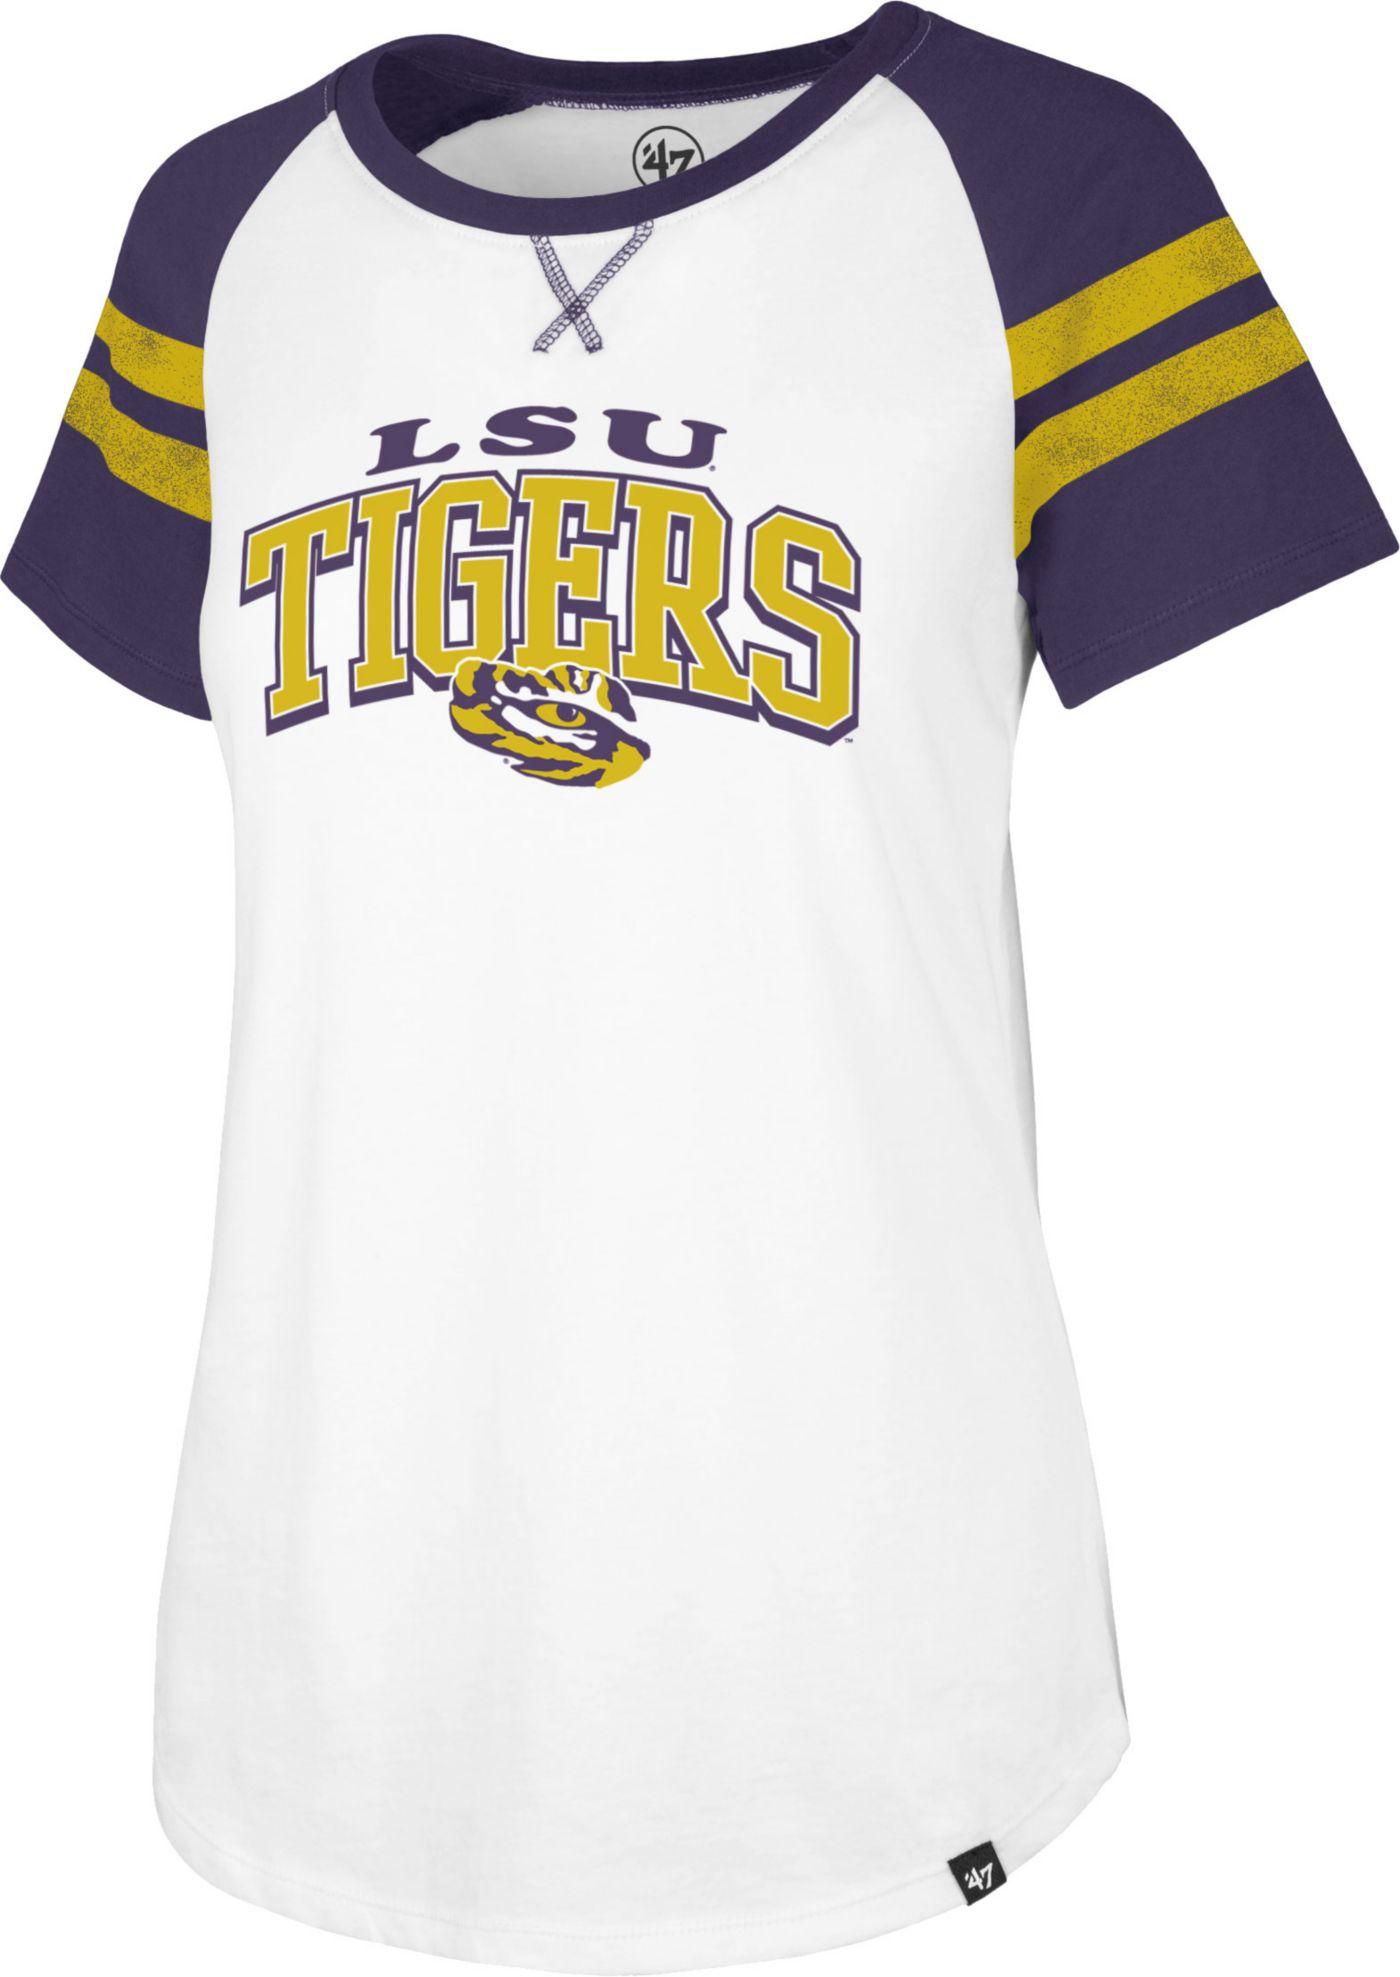 '47 Women's LSU Tigers Flyout Raglan White T-Shirt